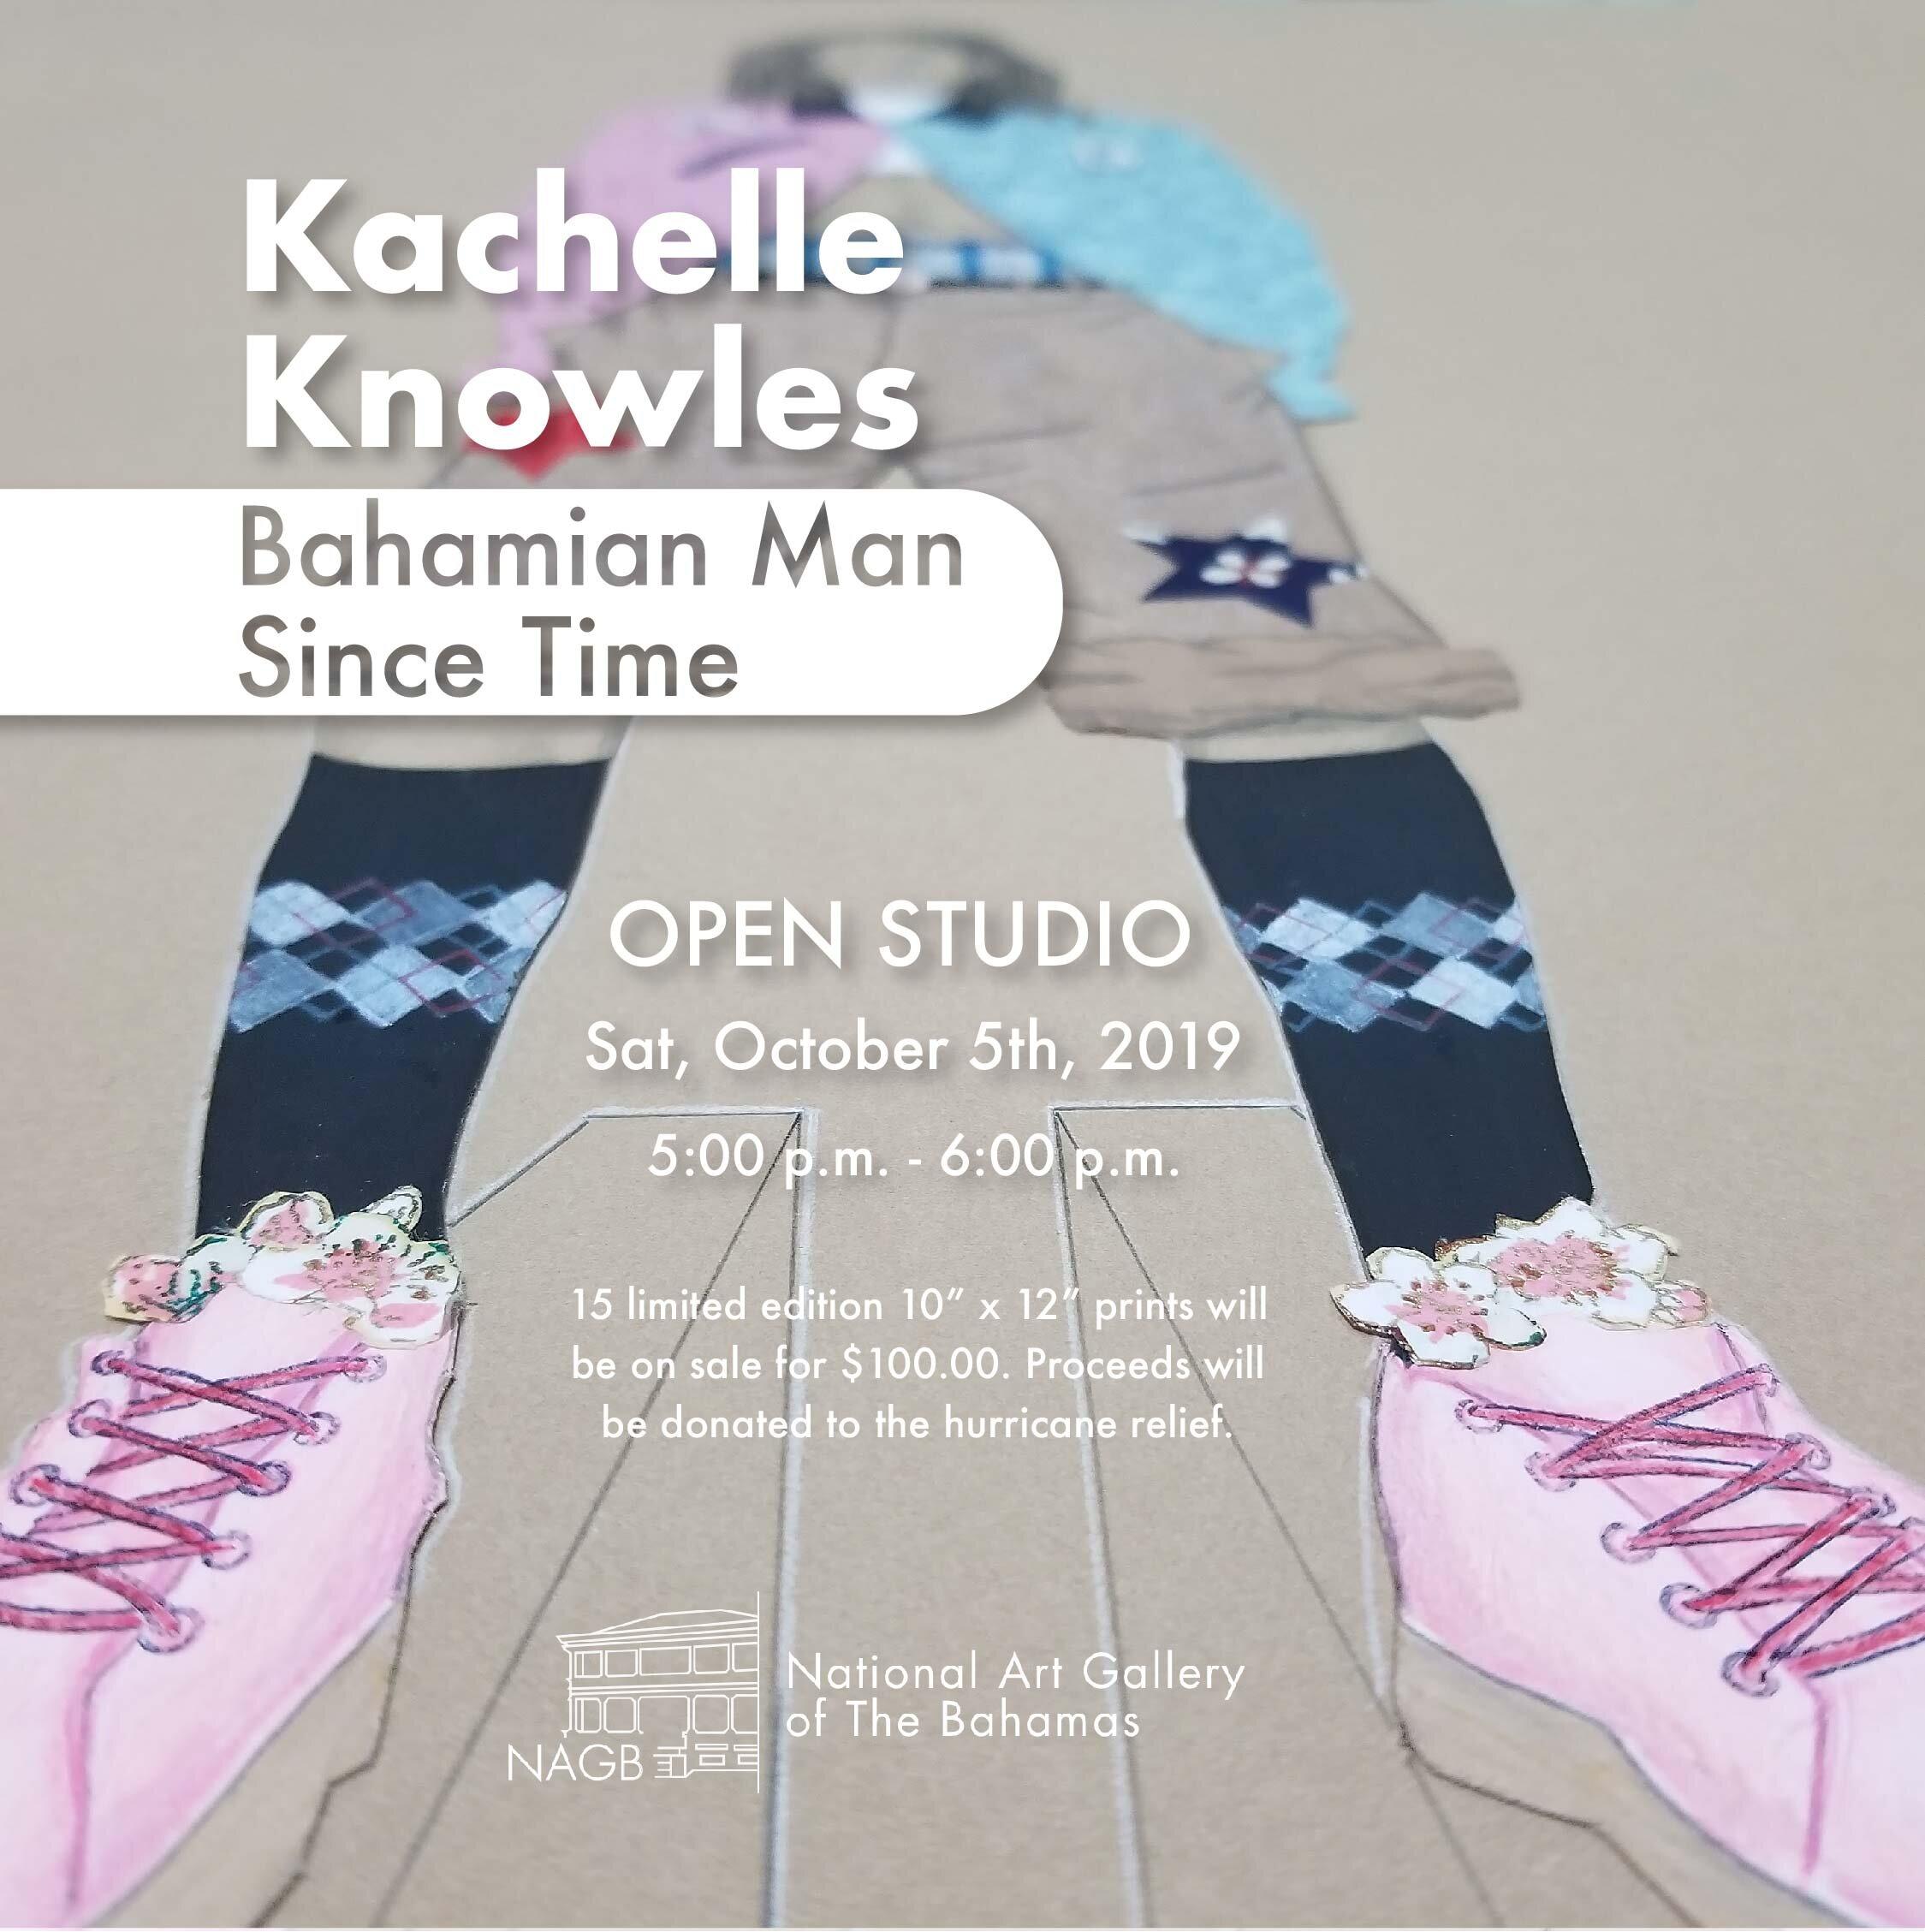 Kachelle_Open_Studios_Updated-03.jpg